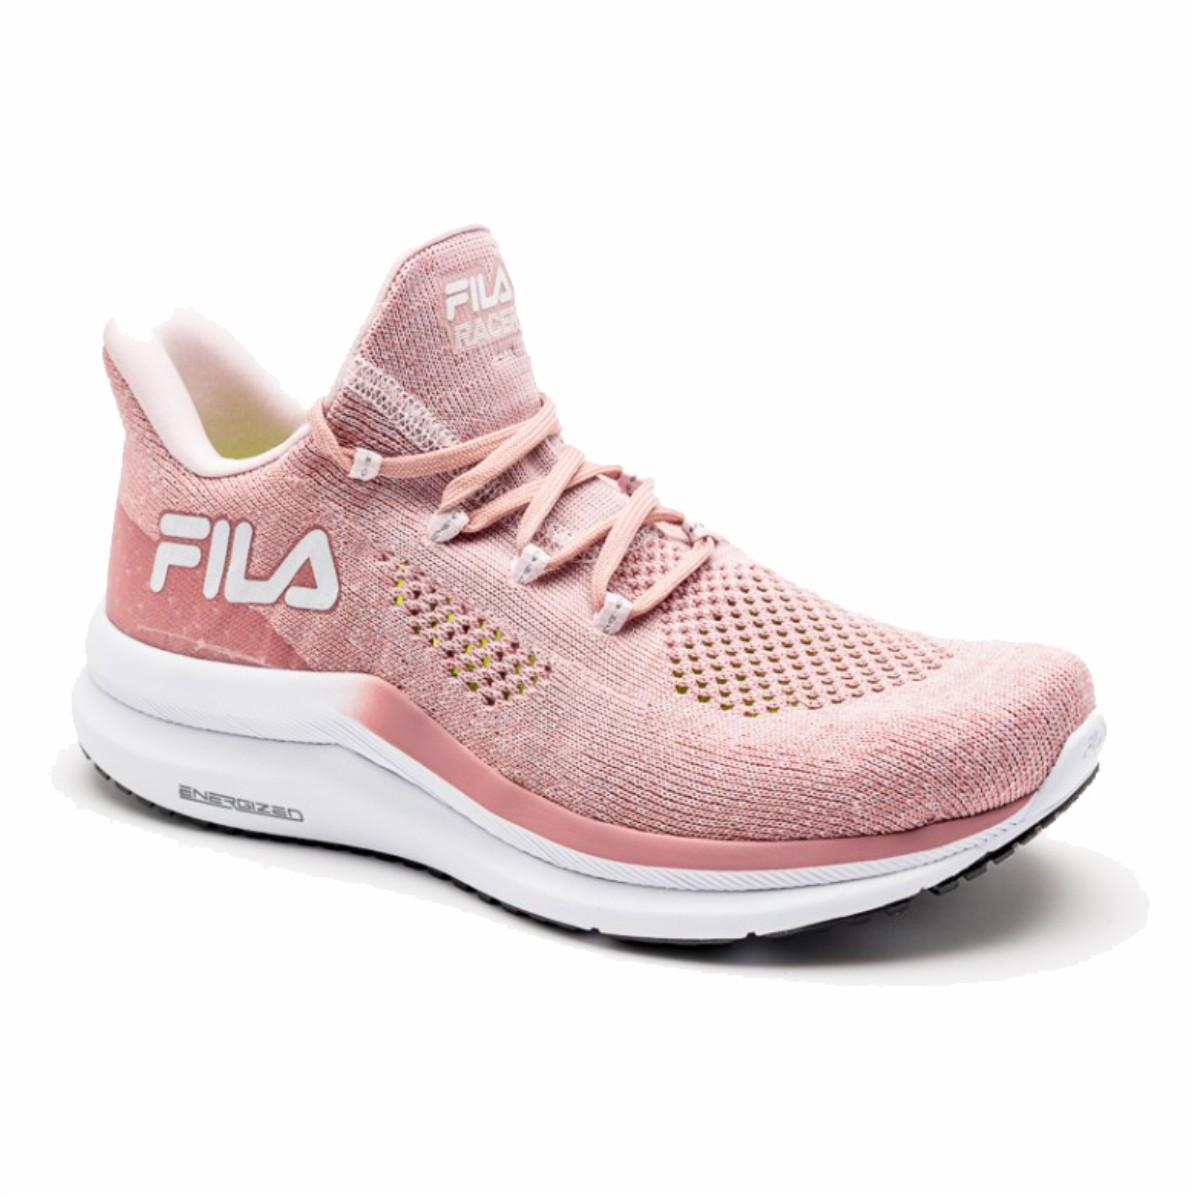 Tenis Fila Racer Knit Energized Feminino Running Training Rose